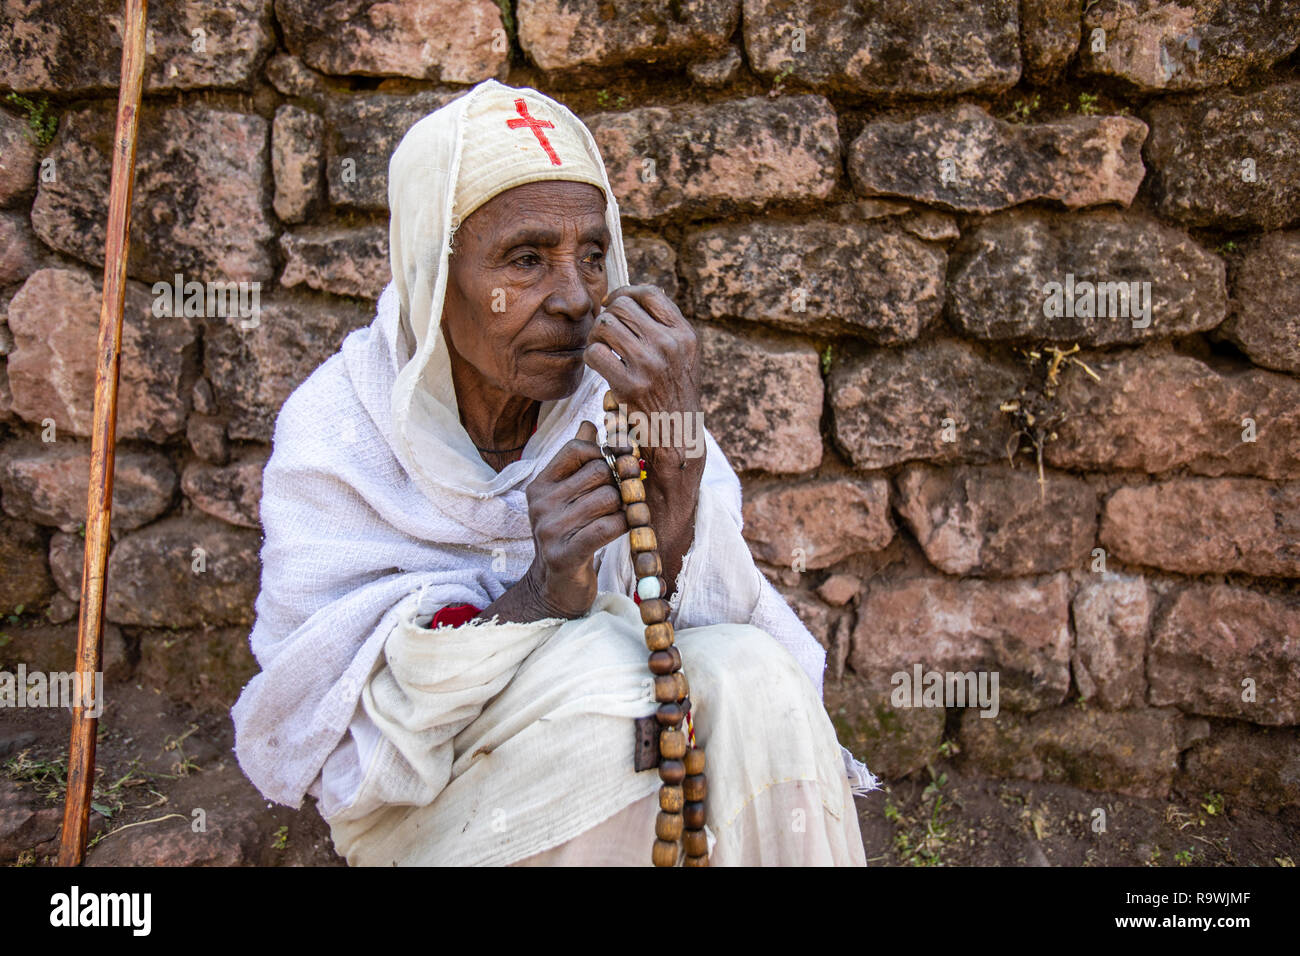 Worshiper at the rock-cut church of House of the Saviour of the World at Lalibela, Ethiopia - Stock Image